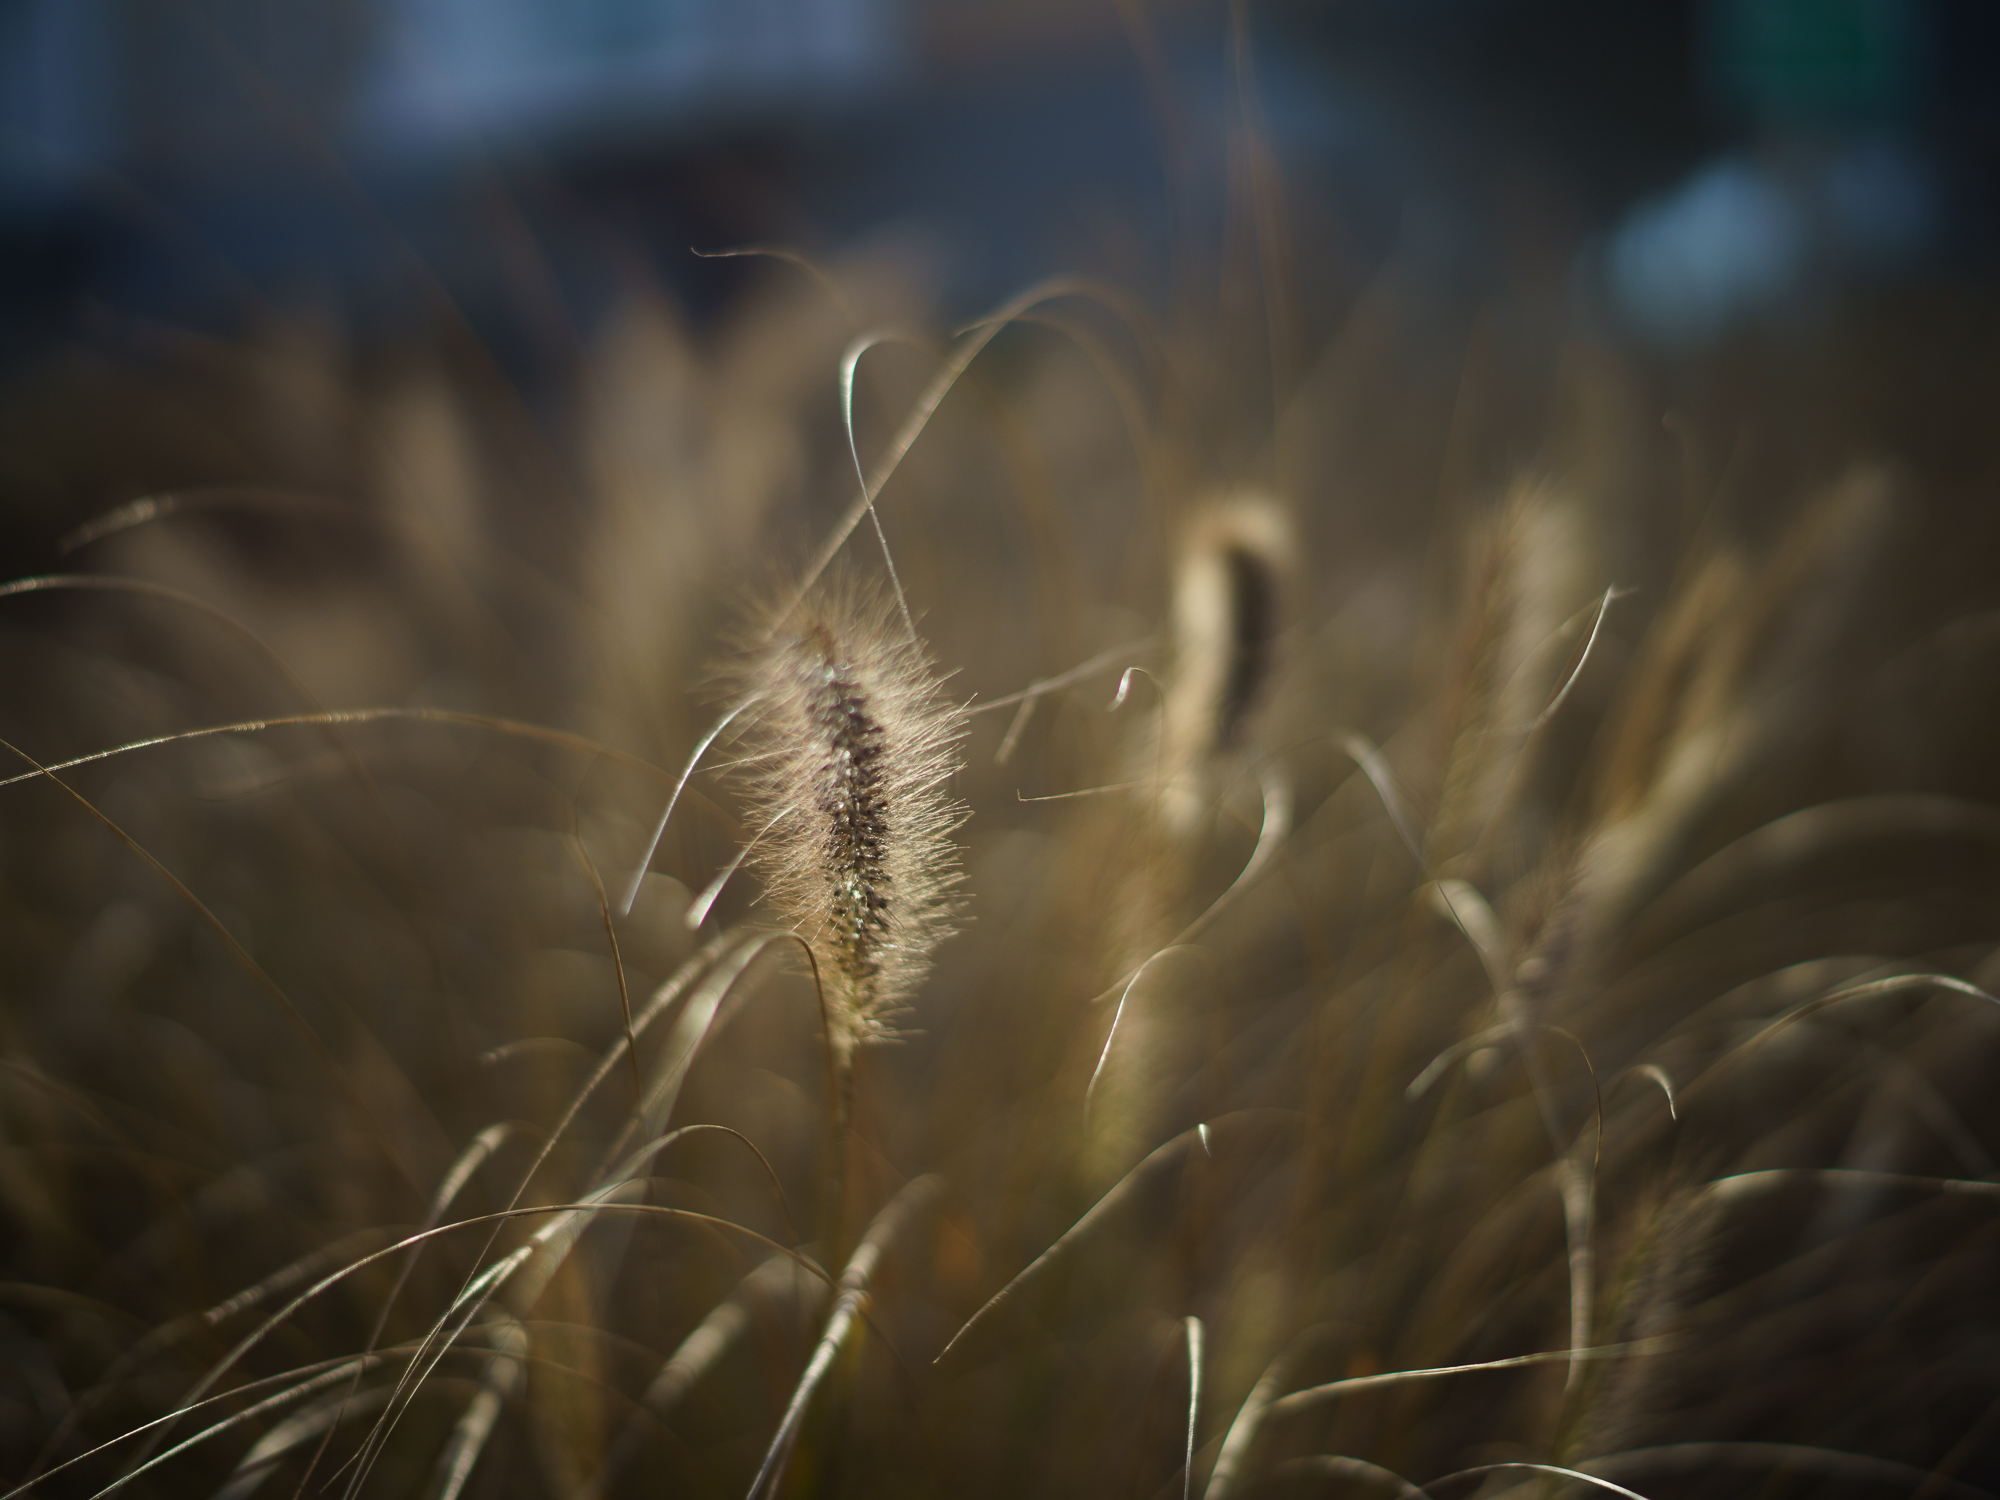 Sample Photos - Voigtlander Nokton II 50 mm f/1.5 lens for Leica M